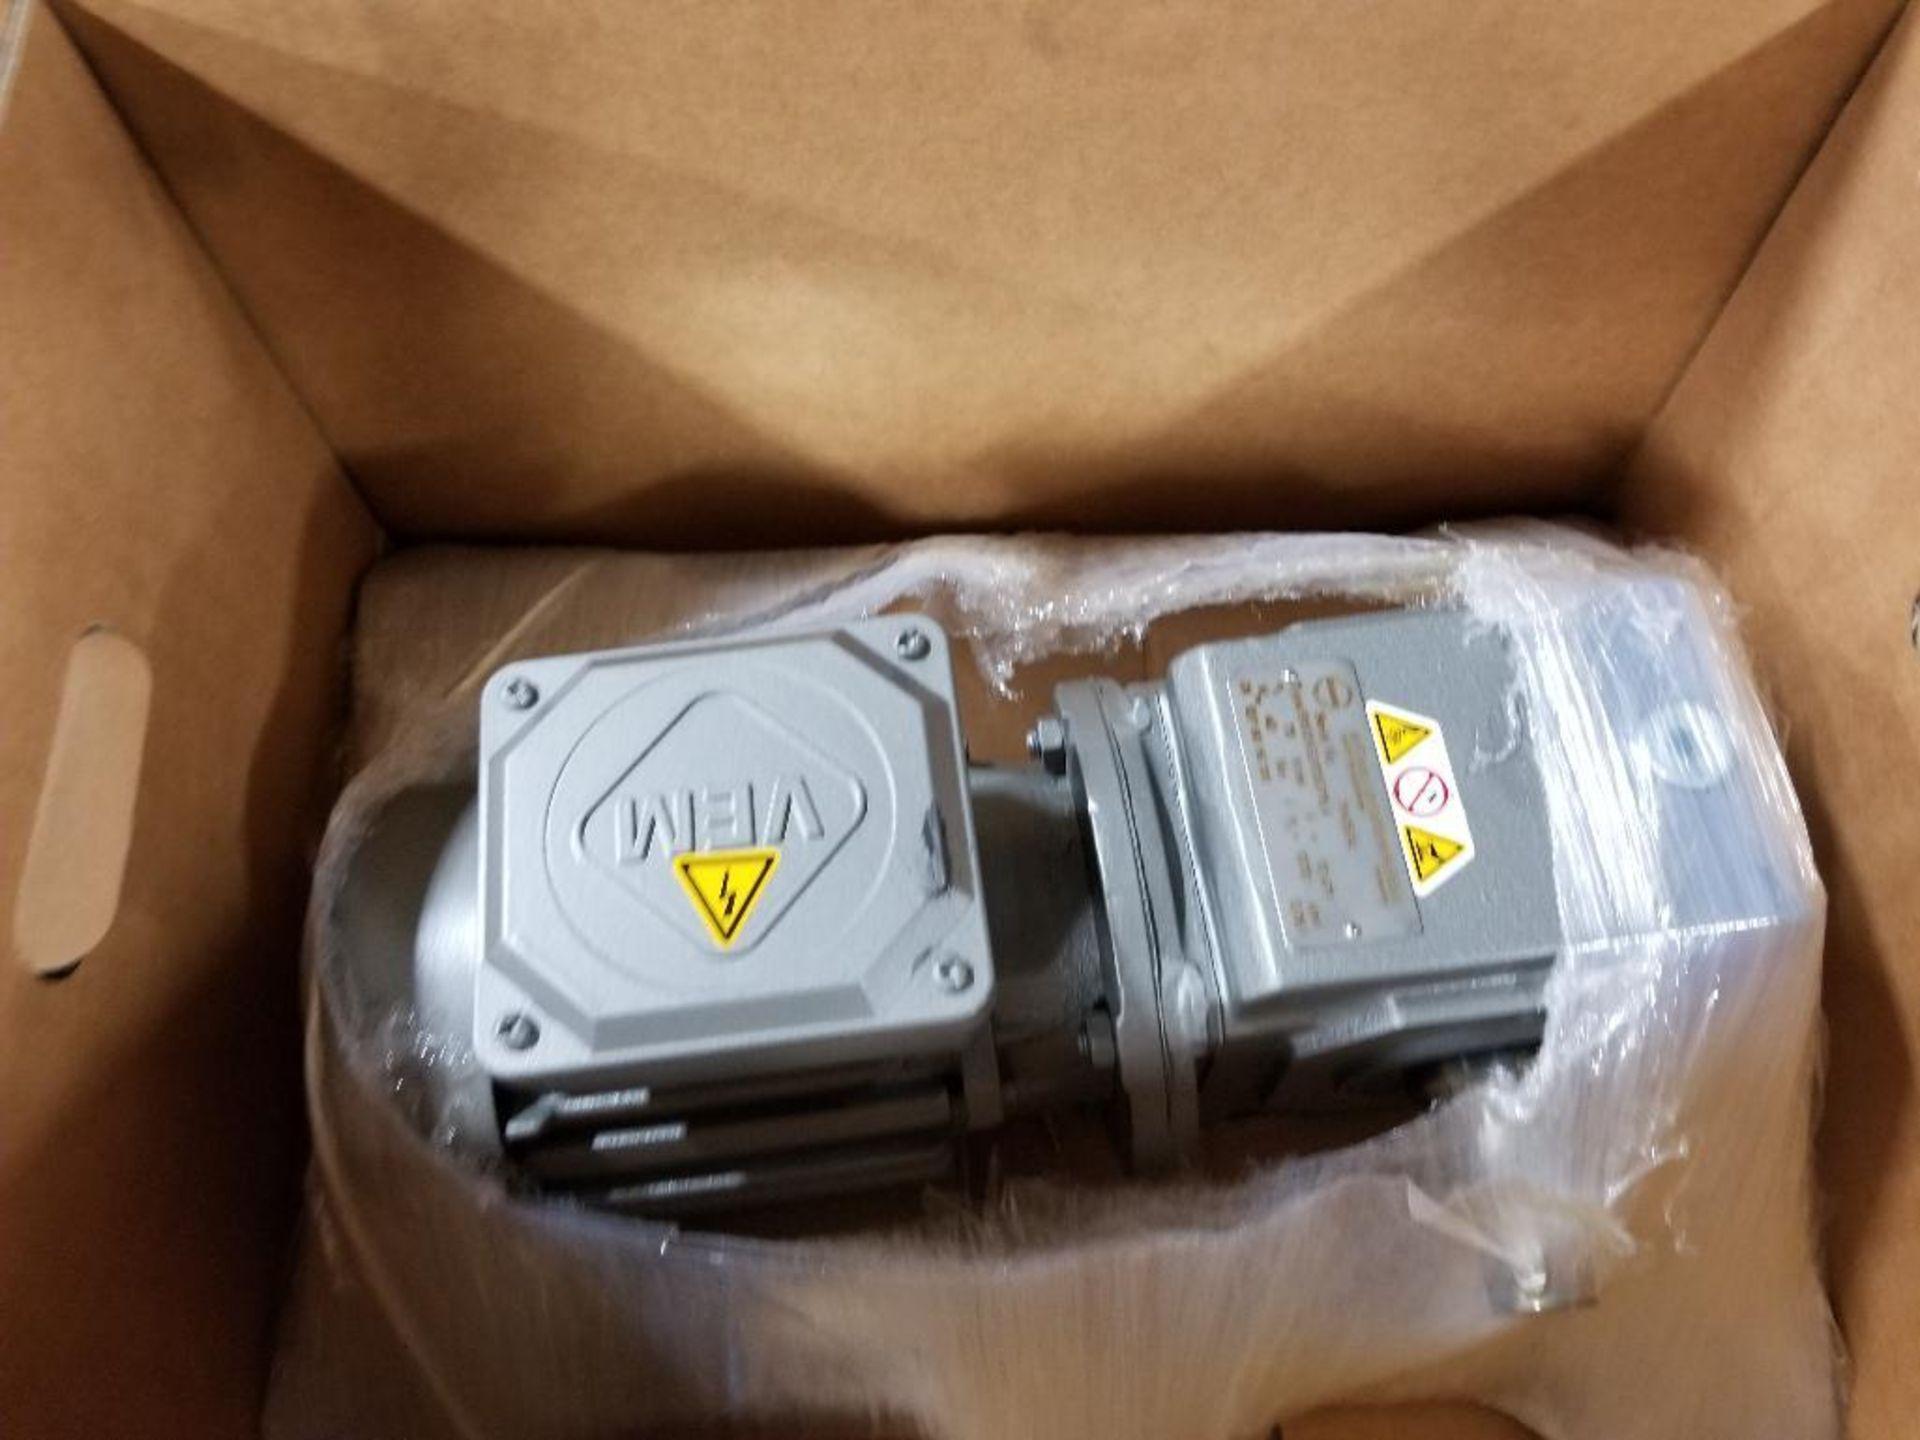 Stober S102VG0175D71L4 gear box. - Image 2 of 5